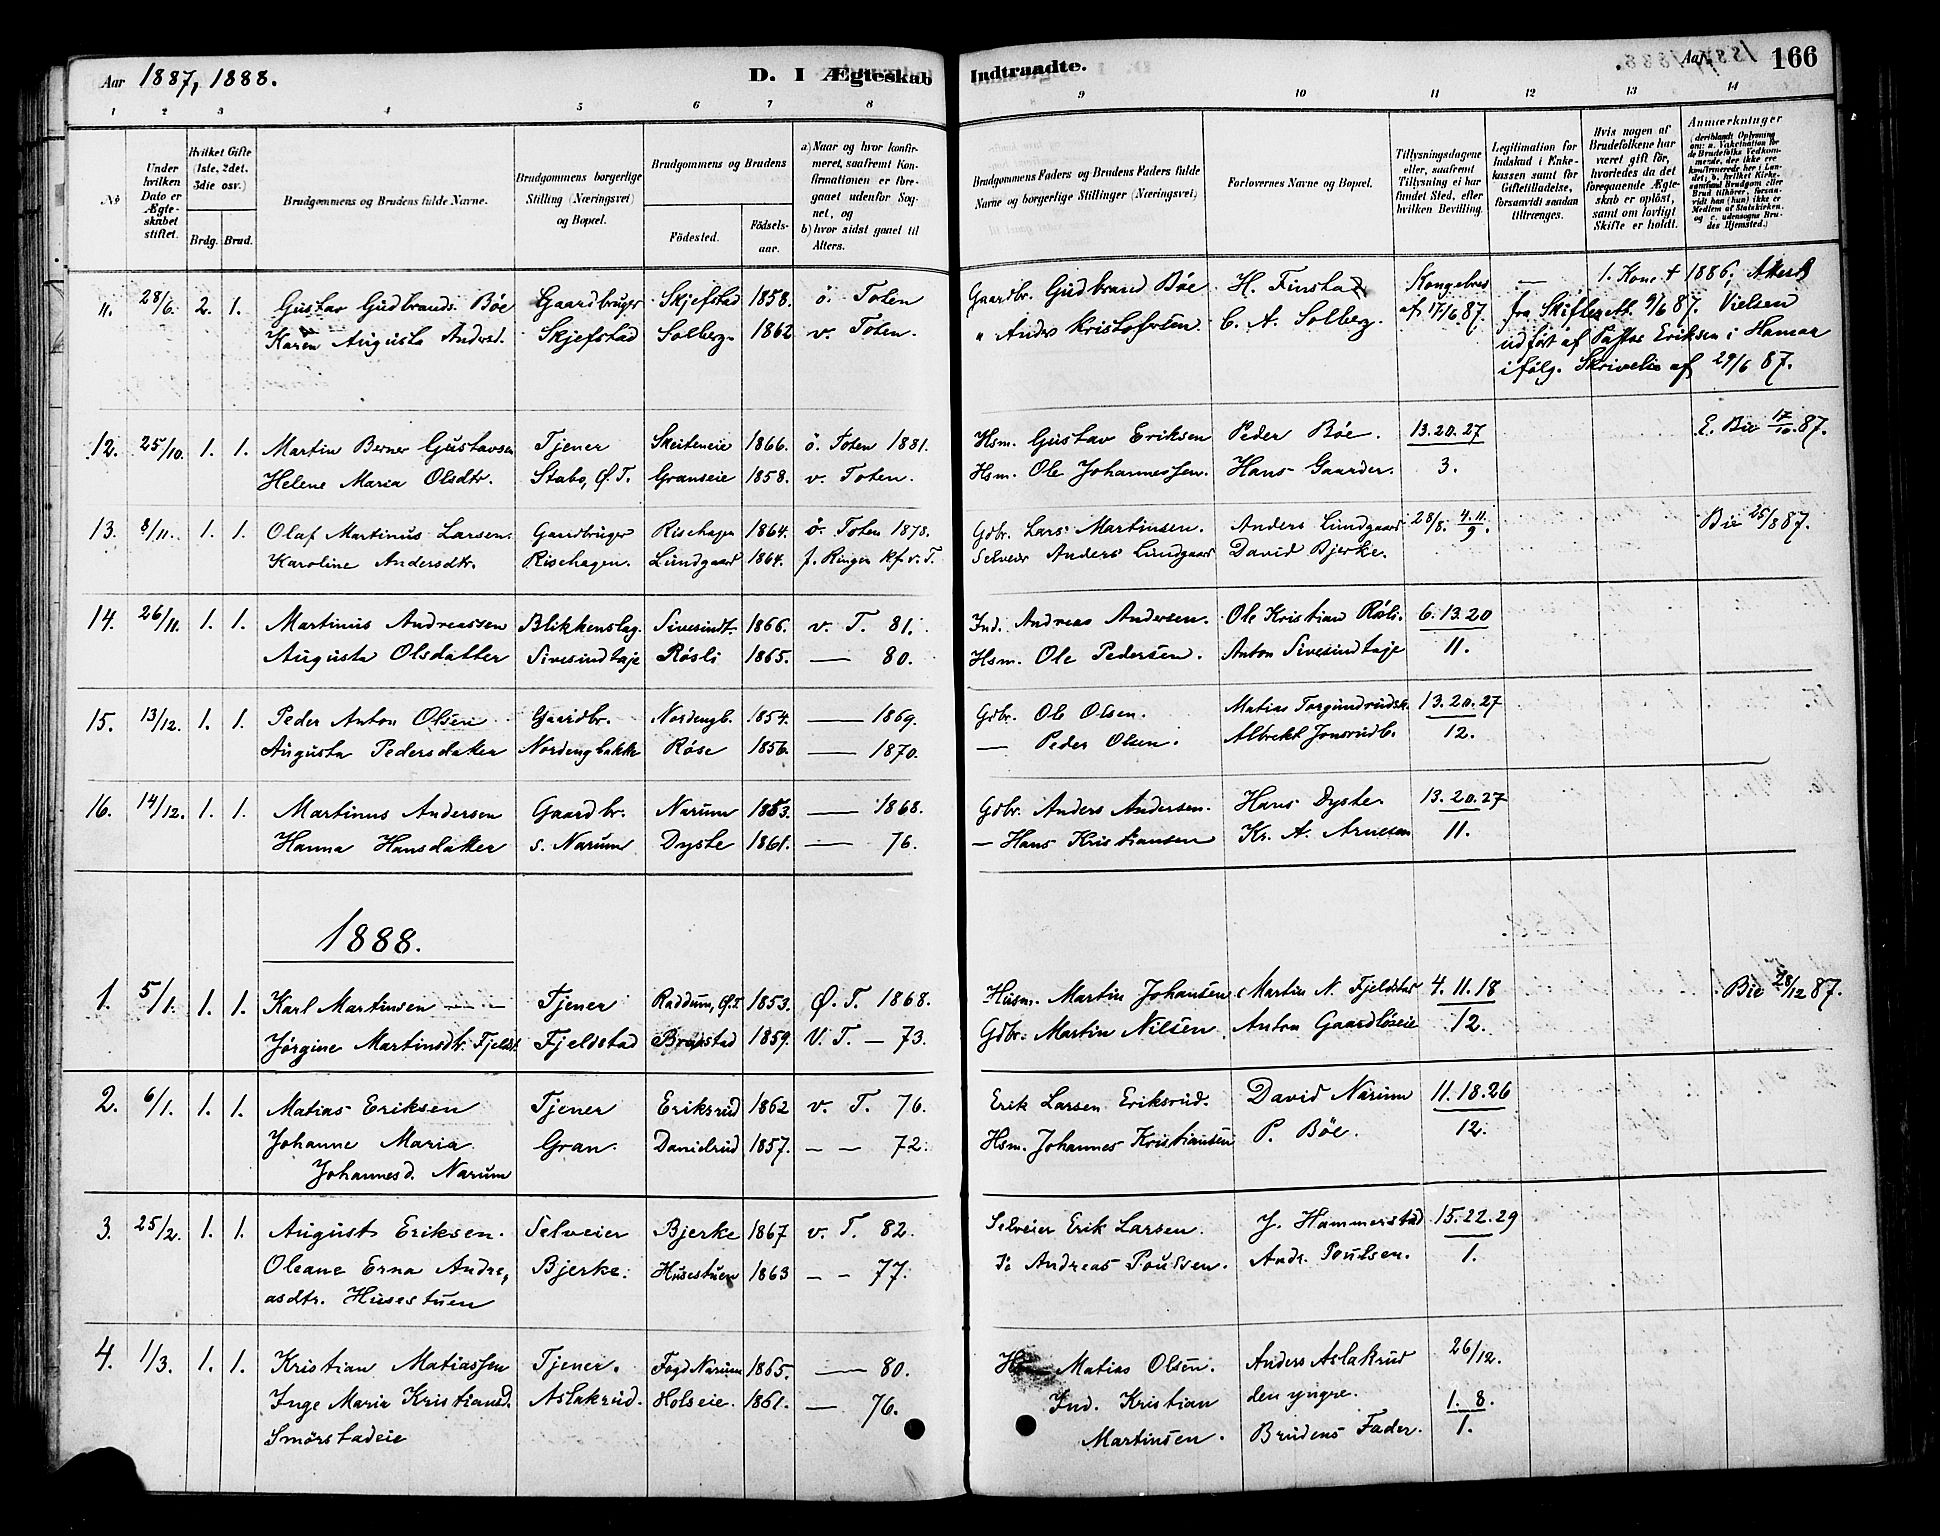 SAH, Vestre Toten prestekontor, H/Ha/Haa/L0010: Ministerialbok nr. 10, 1878-1894, s. 166